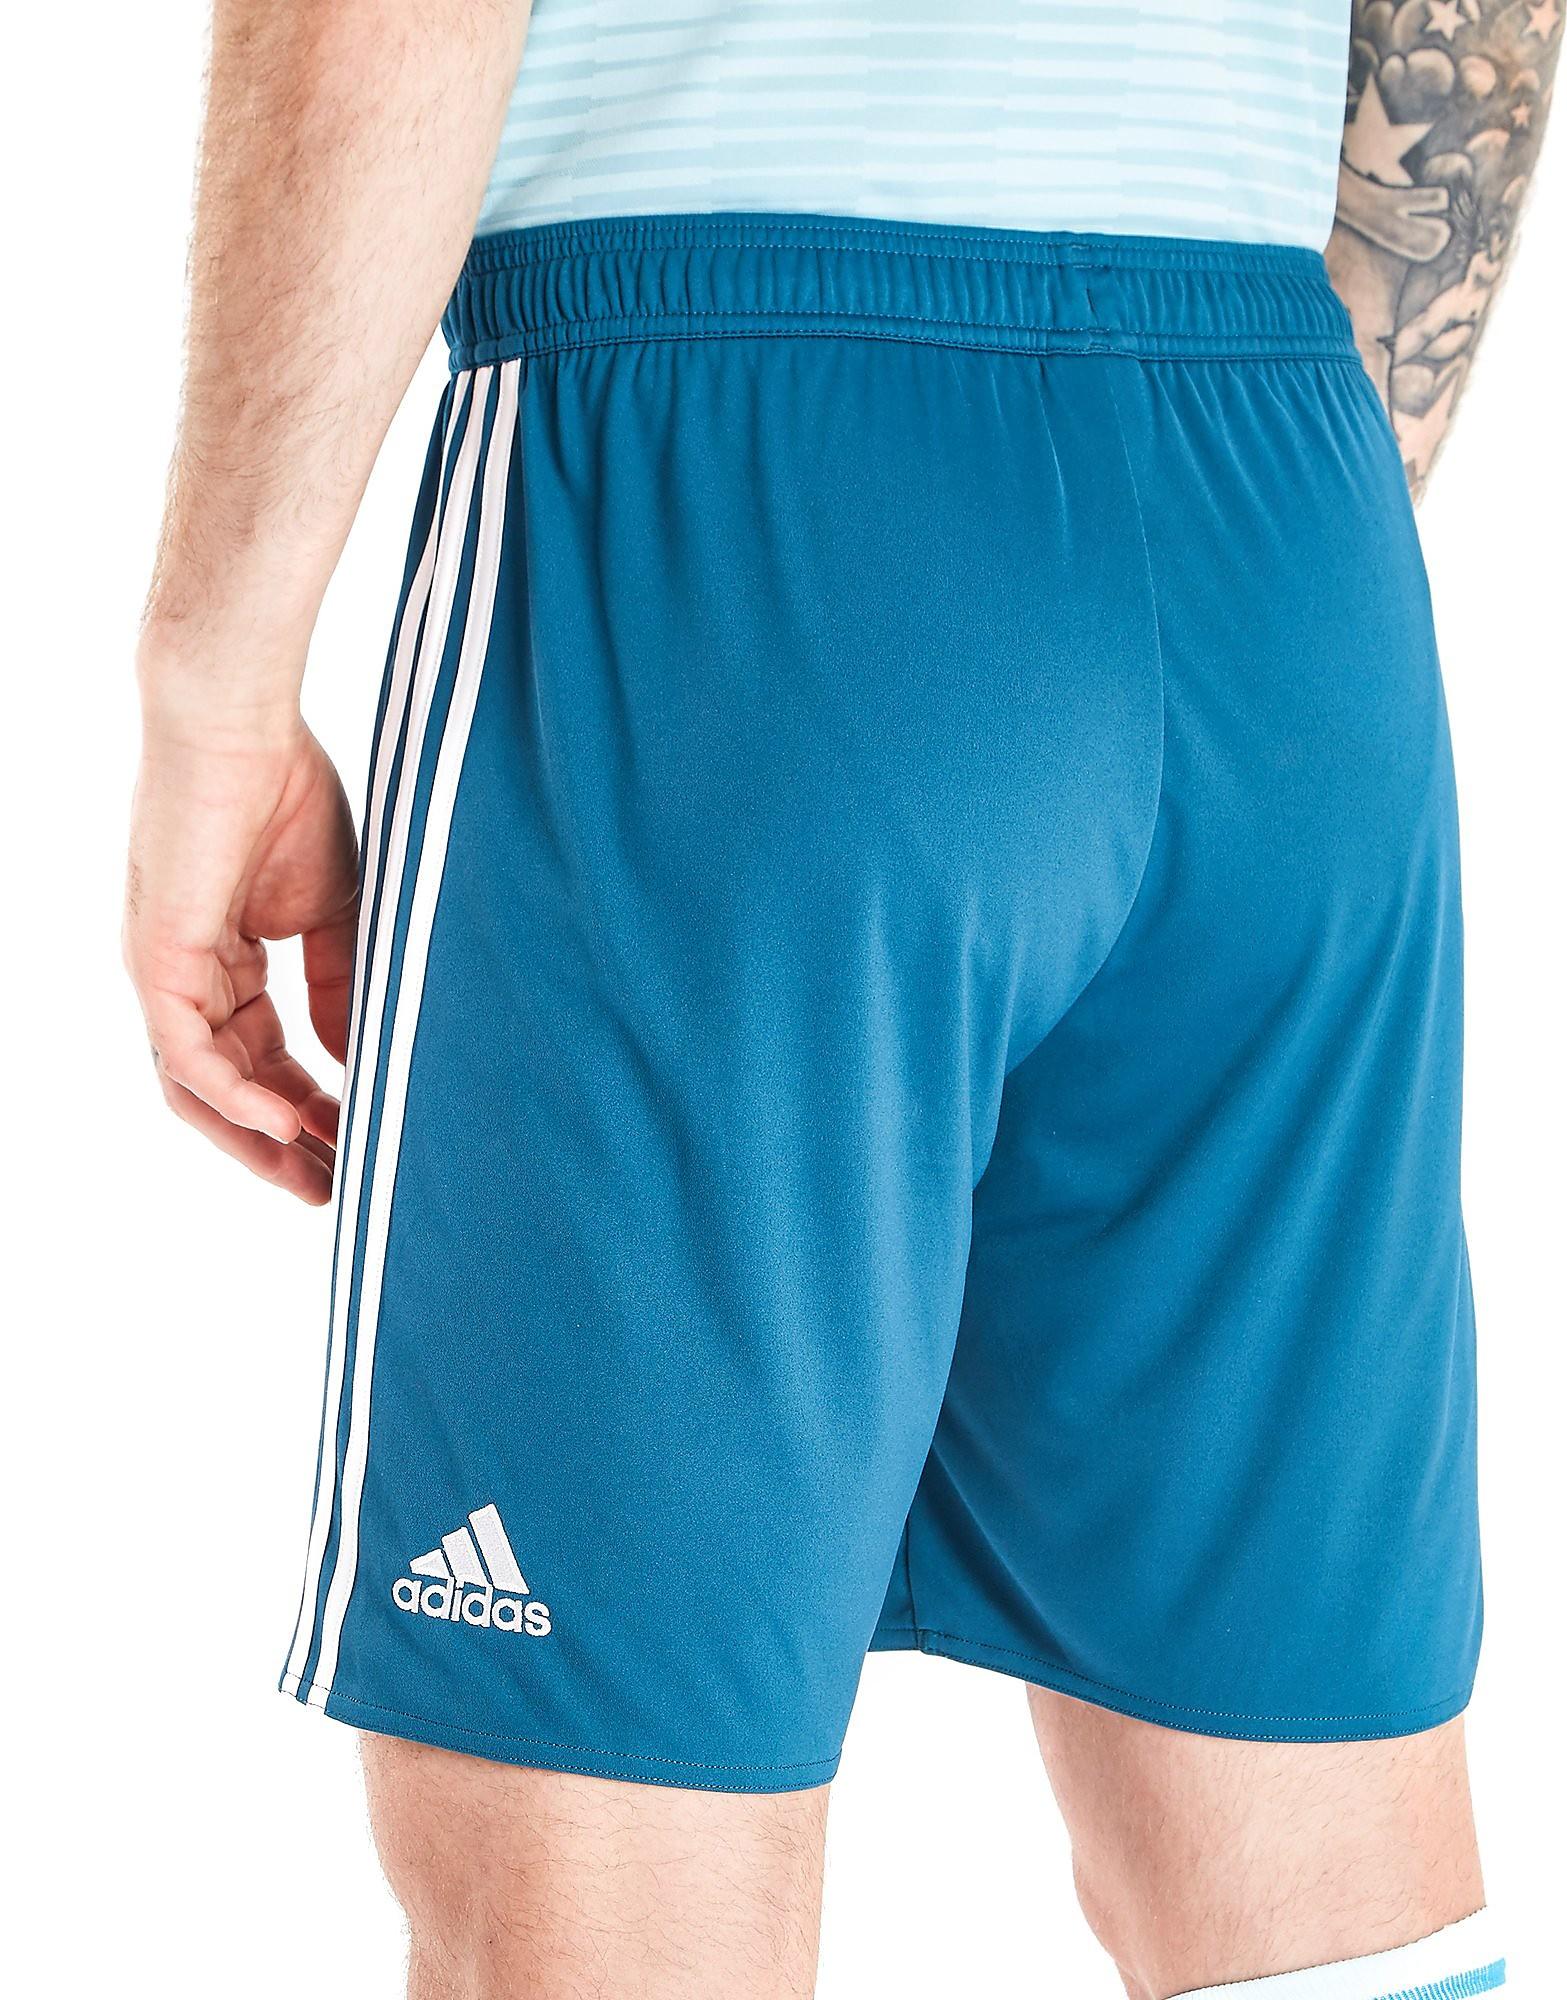 adidas Northern Ireland 2018 Away Shorts